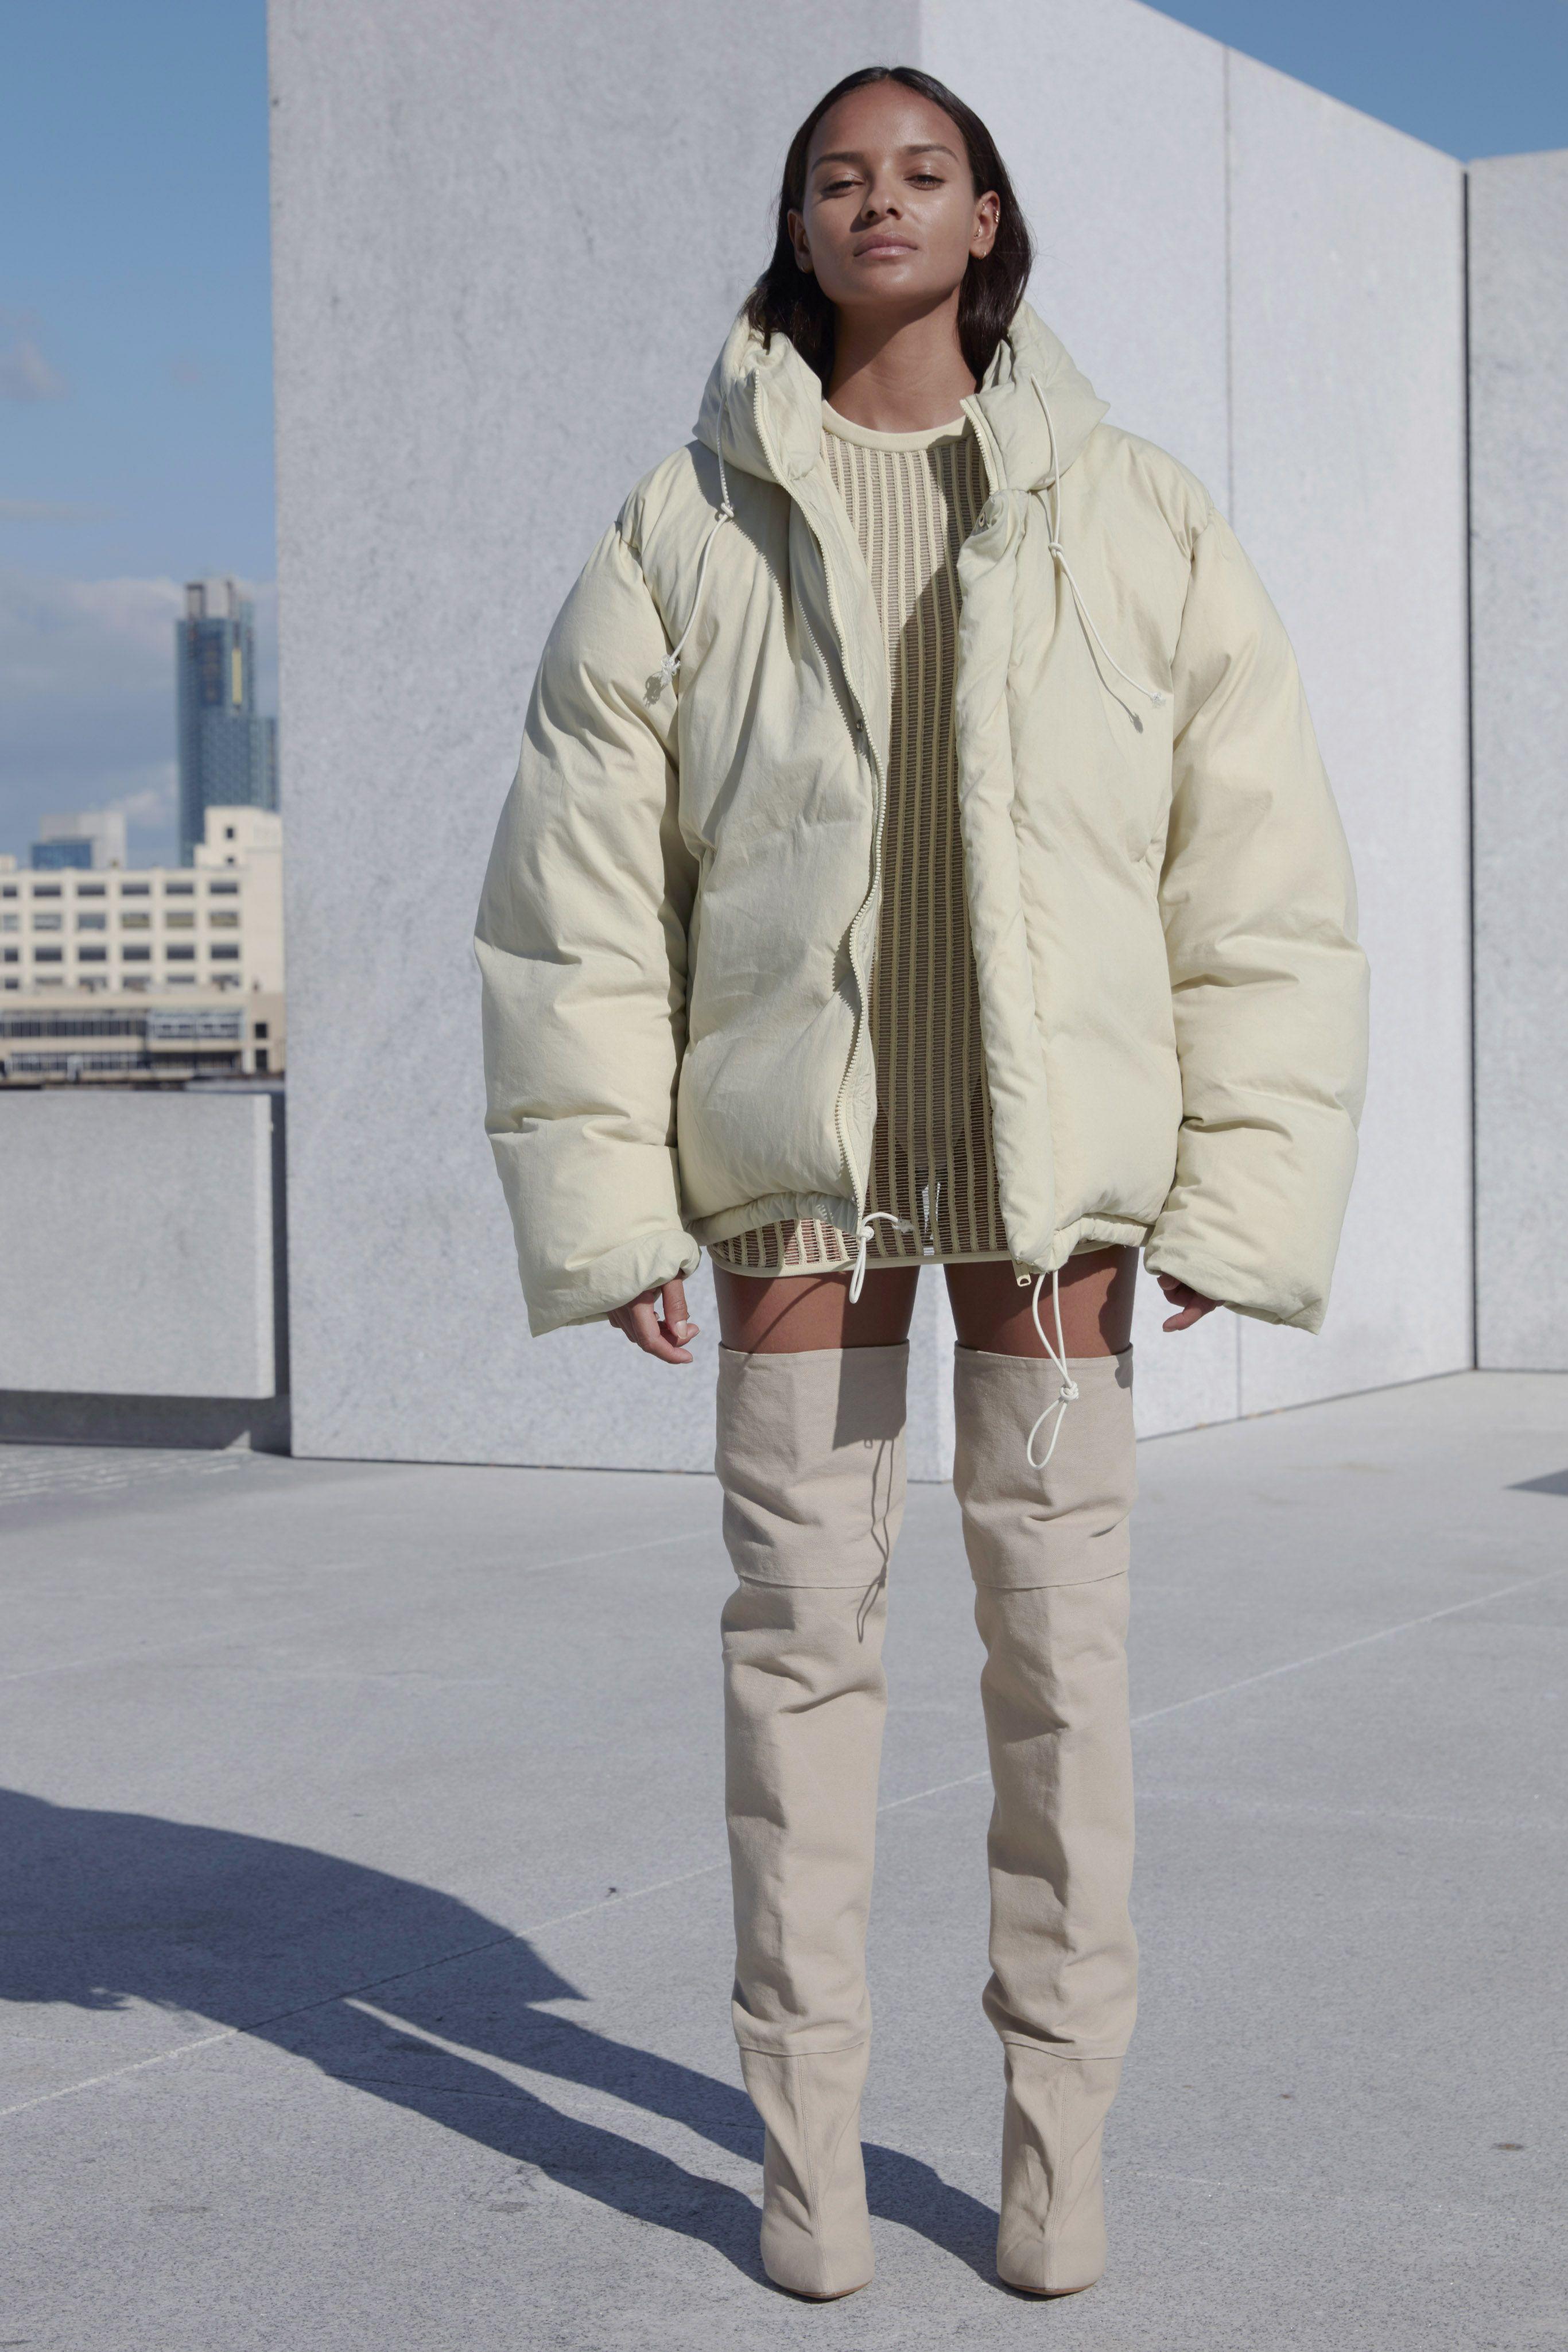 Yeezy Season 13 Yeezy Fashion Fashion Yeezy Season 4